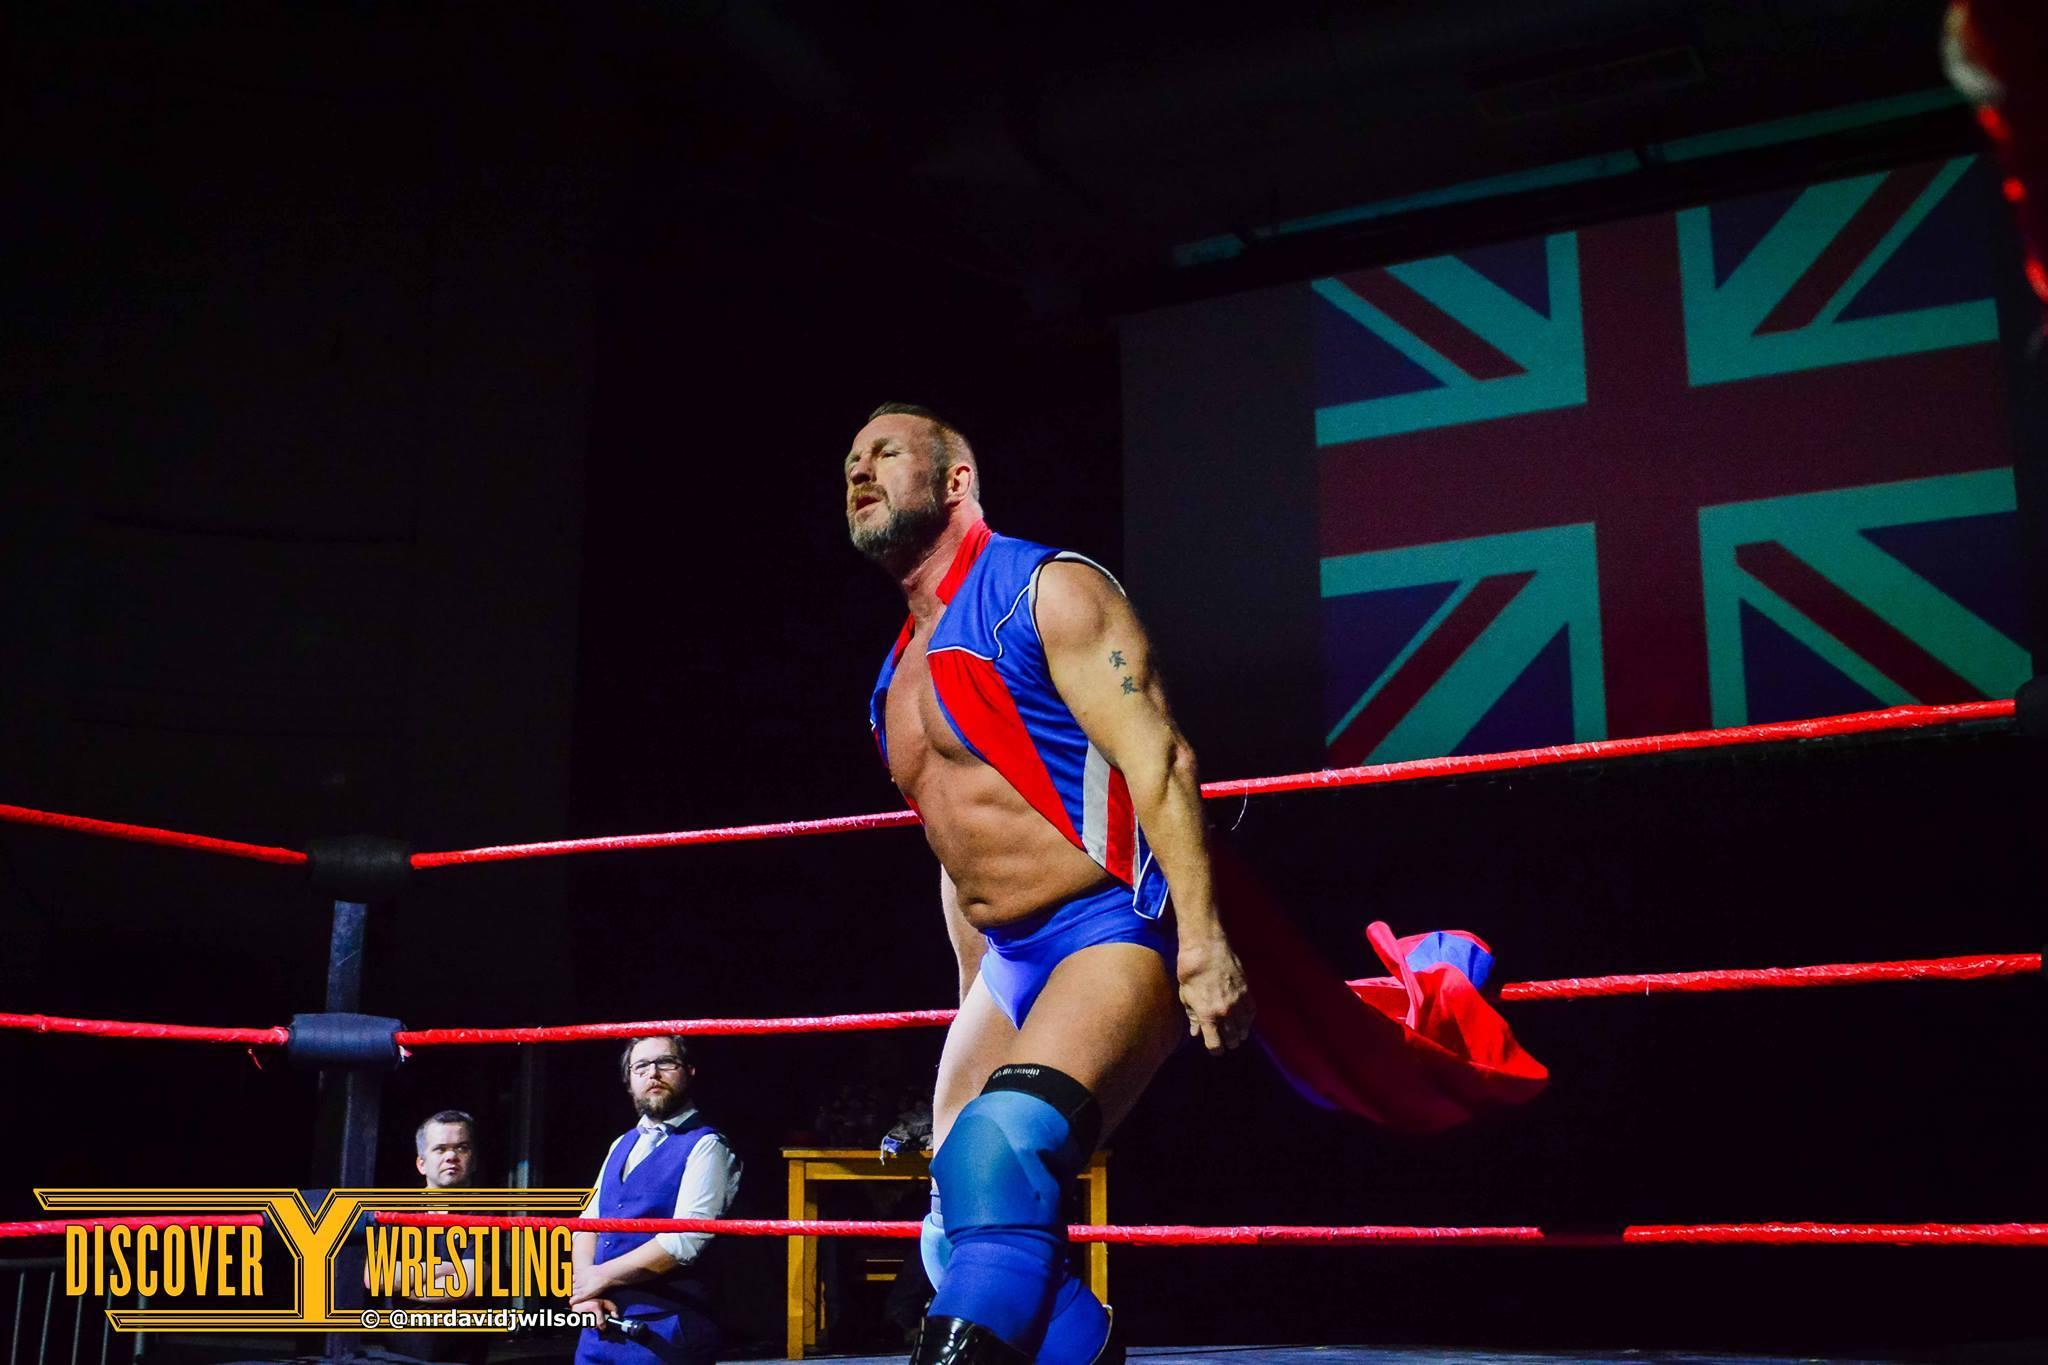 Doug Williams Discovery Wrestling